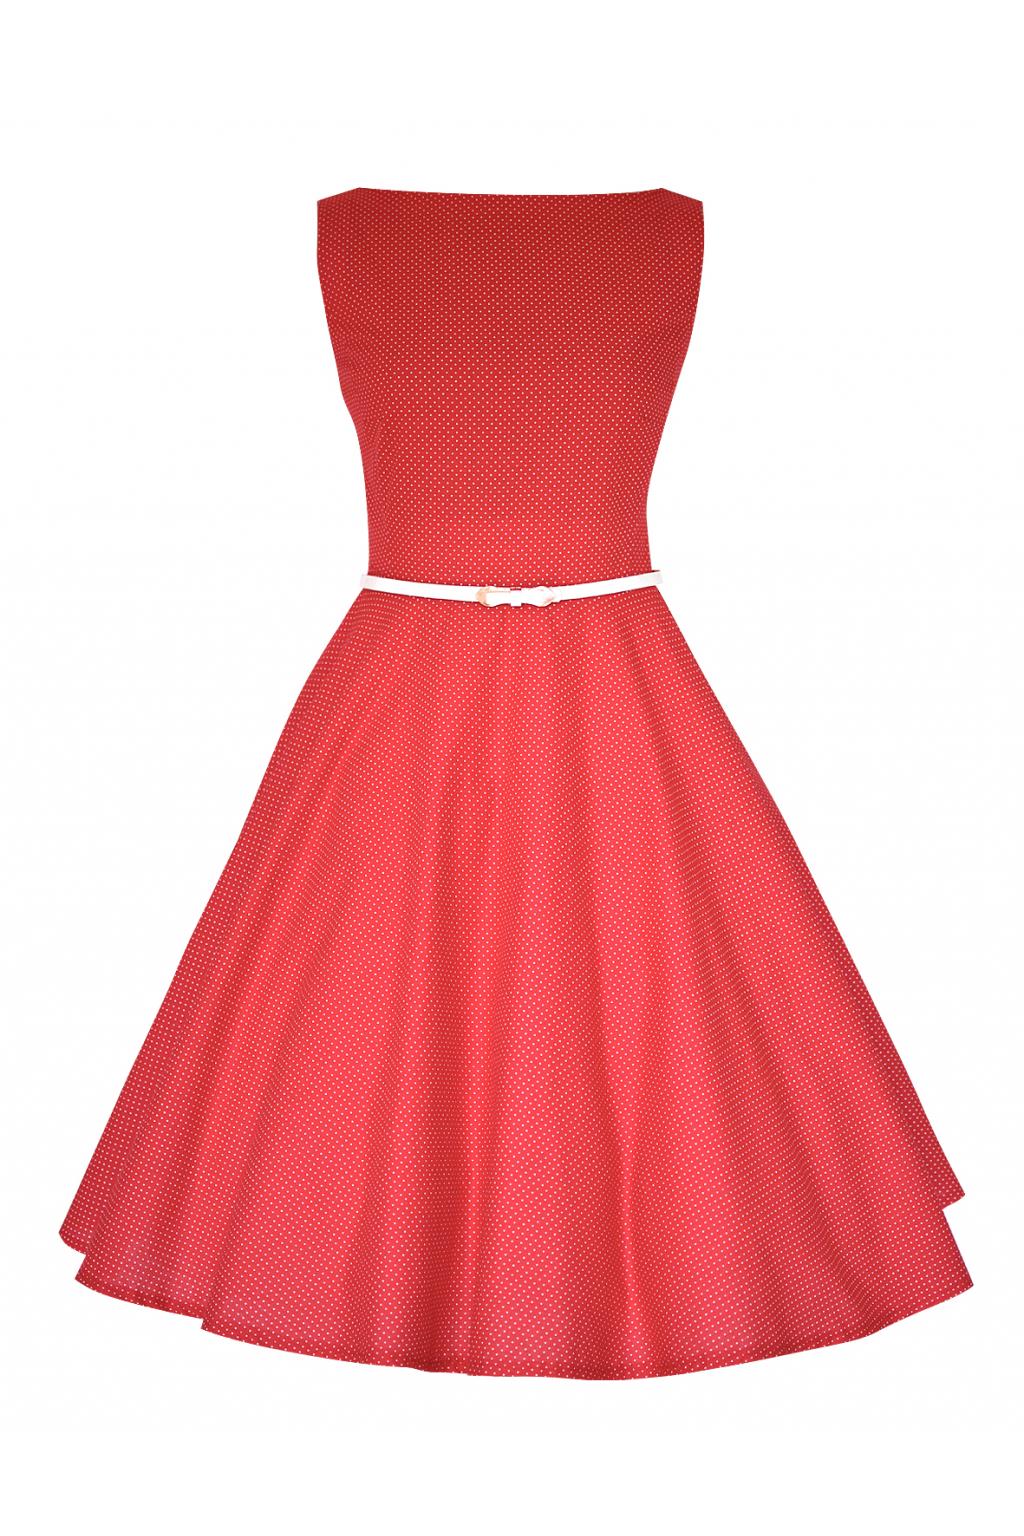 SUSAN retro šaty červené s mini puntíkem